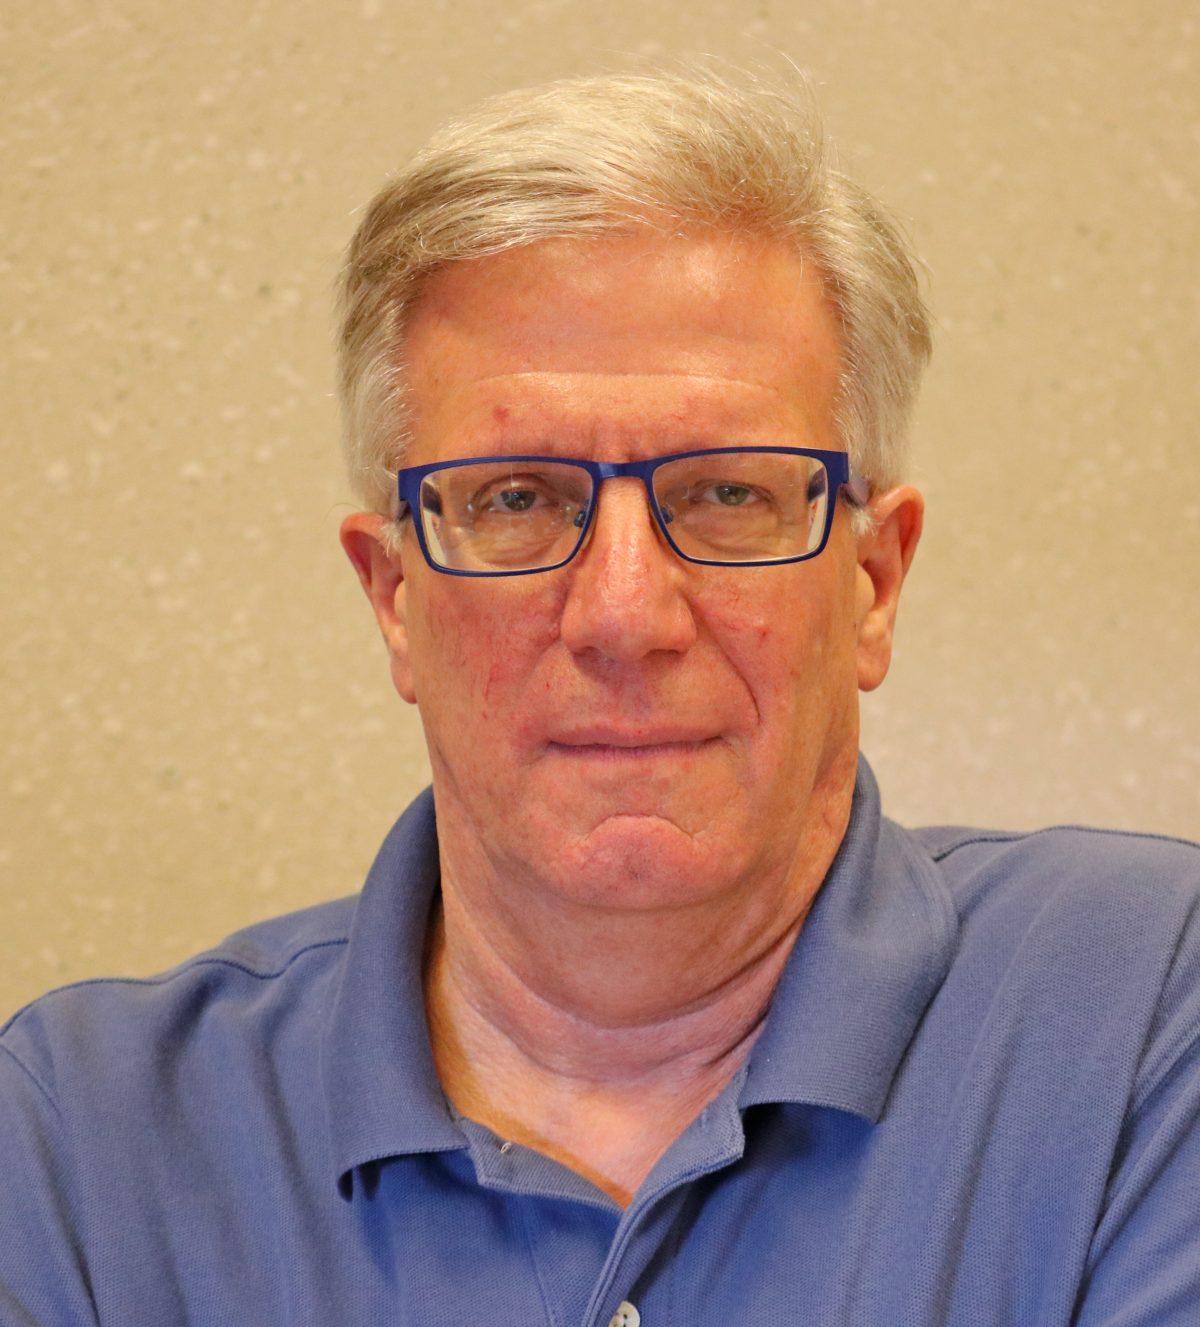 OSU Professor Mark McCord